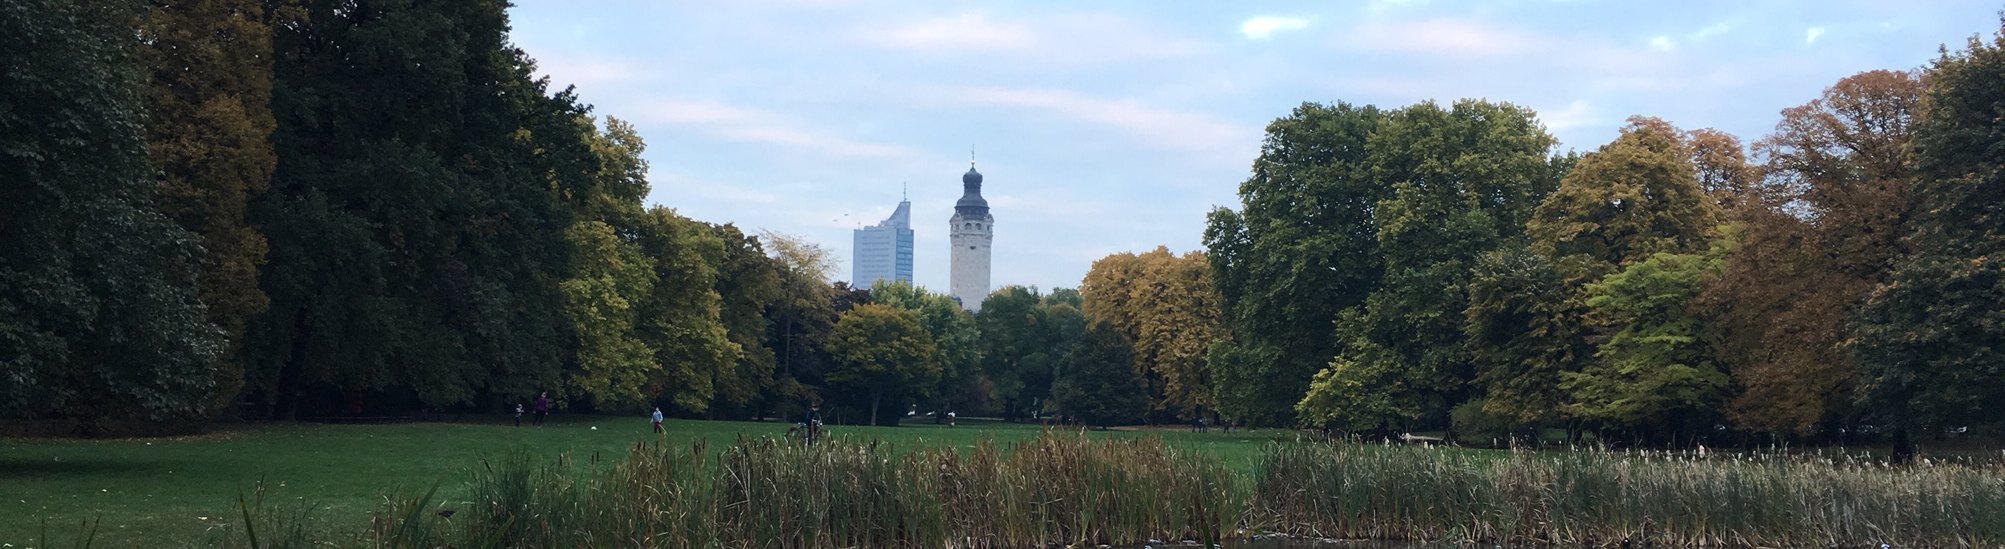 Yoga im Park oder Privat in Leipzig